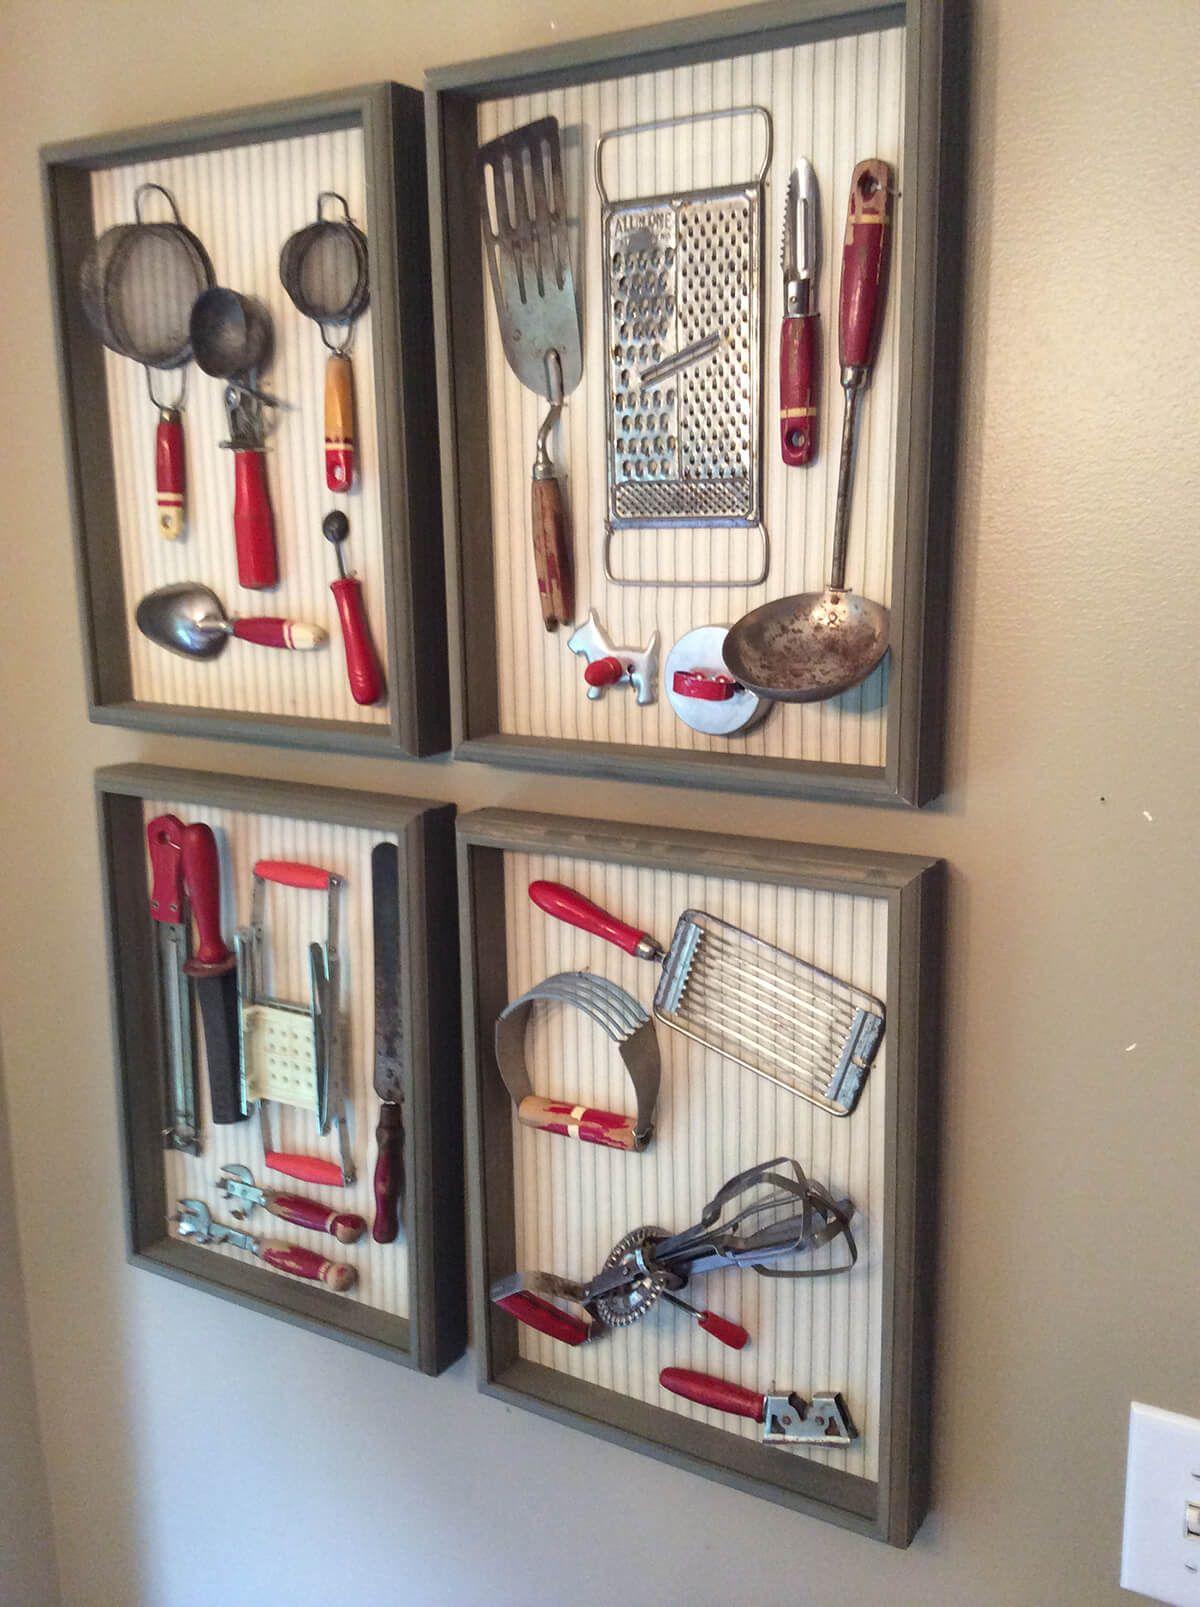 https homebnc com best kitchen wall decor ideas utm source email vintage kitchen utensils on kitchen decor wall ideas id=47521